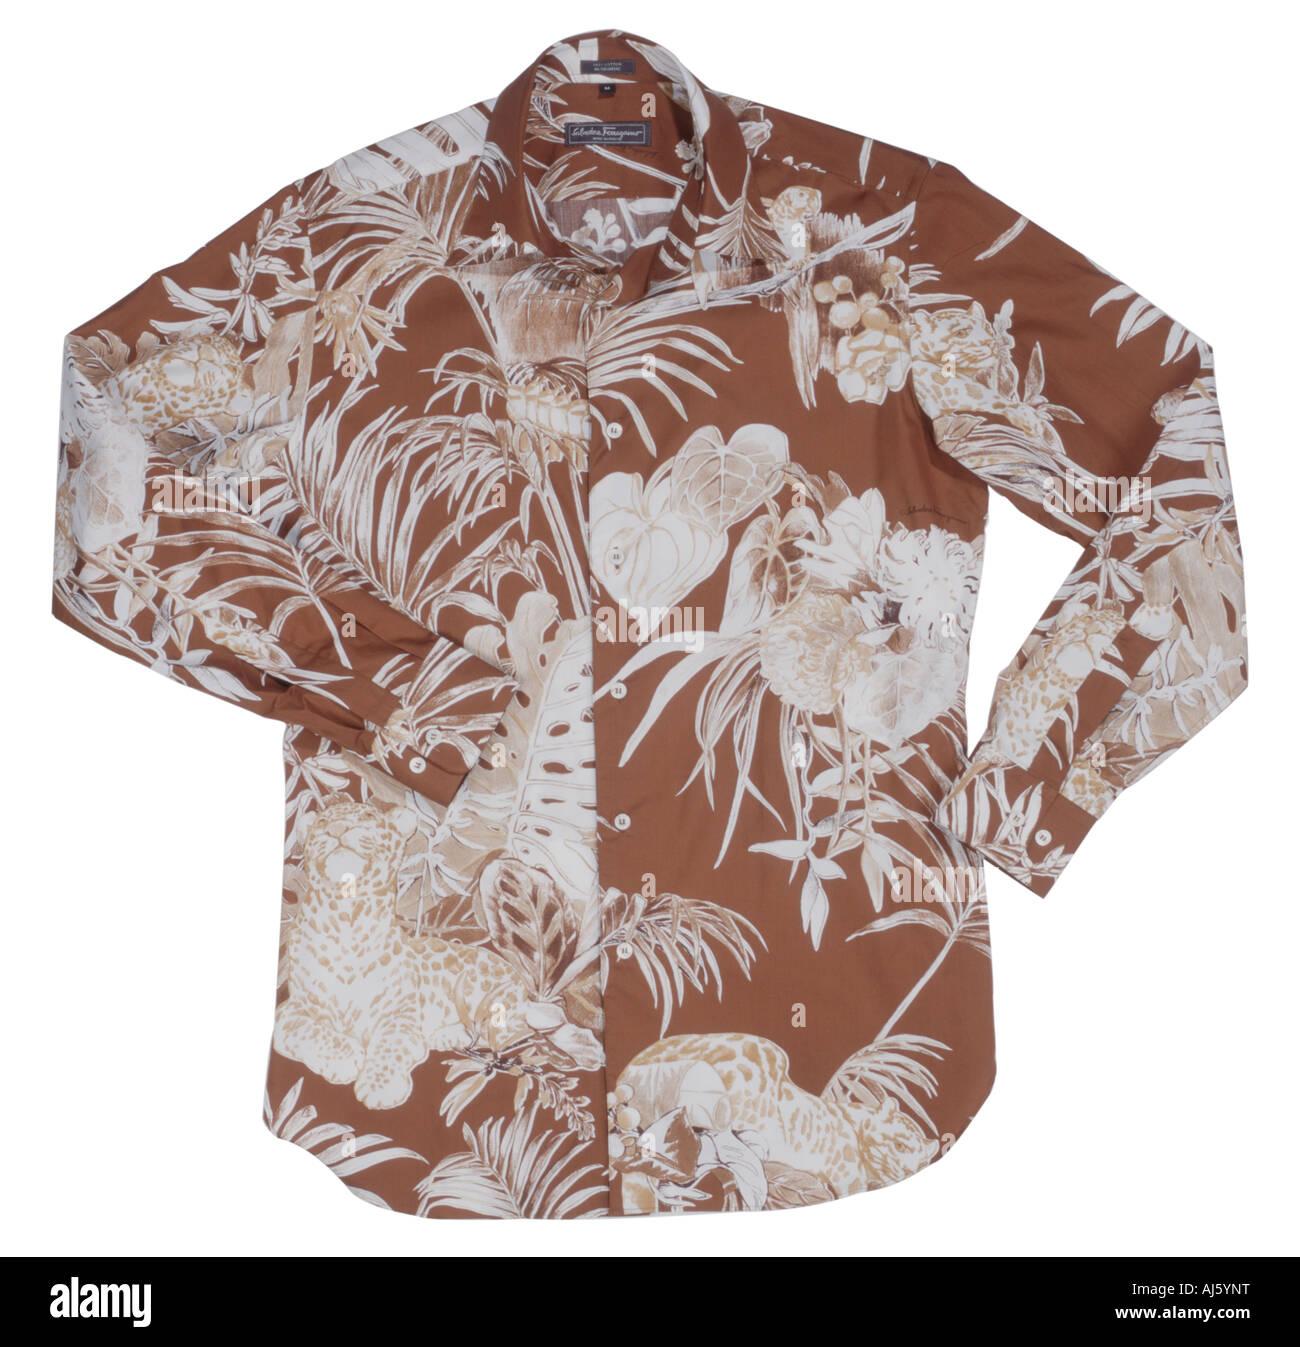 Salvatore Ferragamo shirt - Stock Image